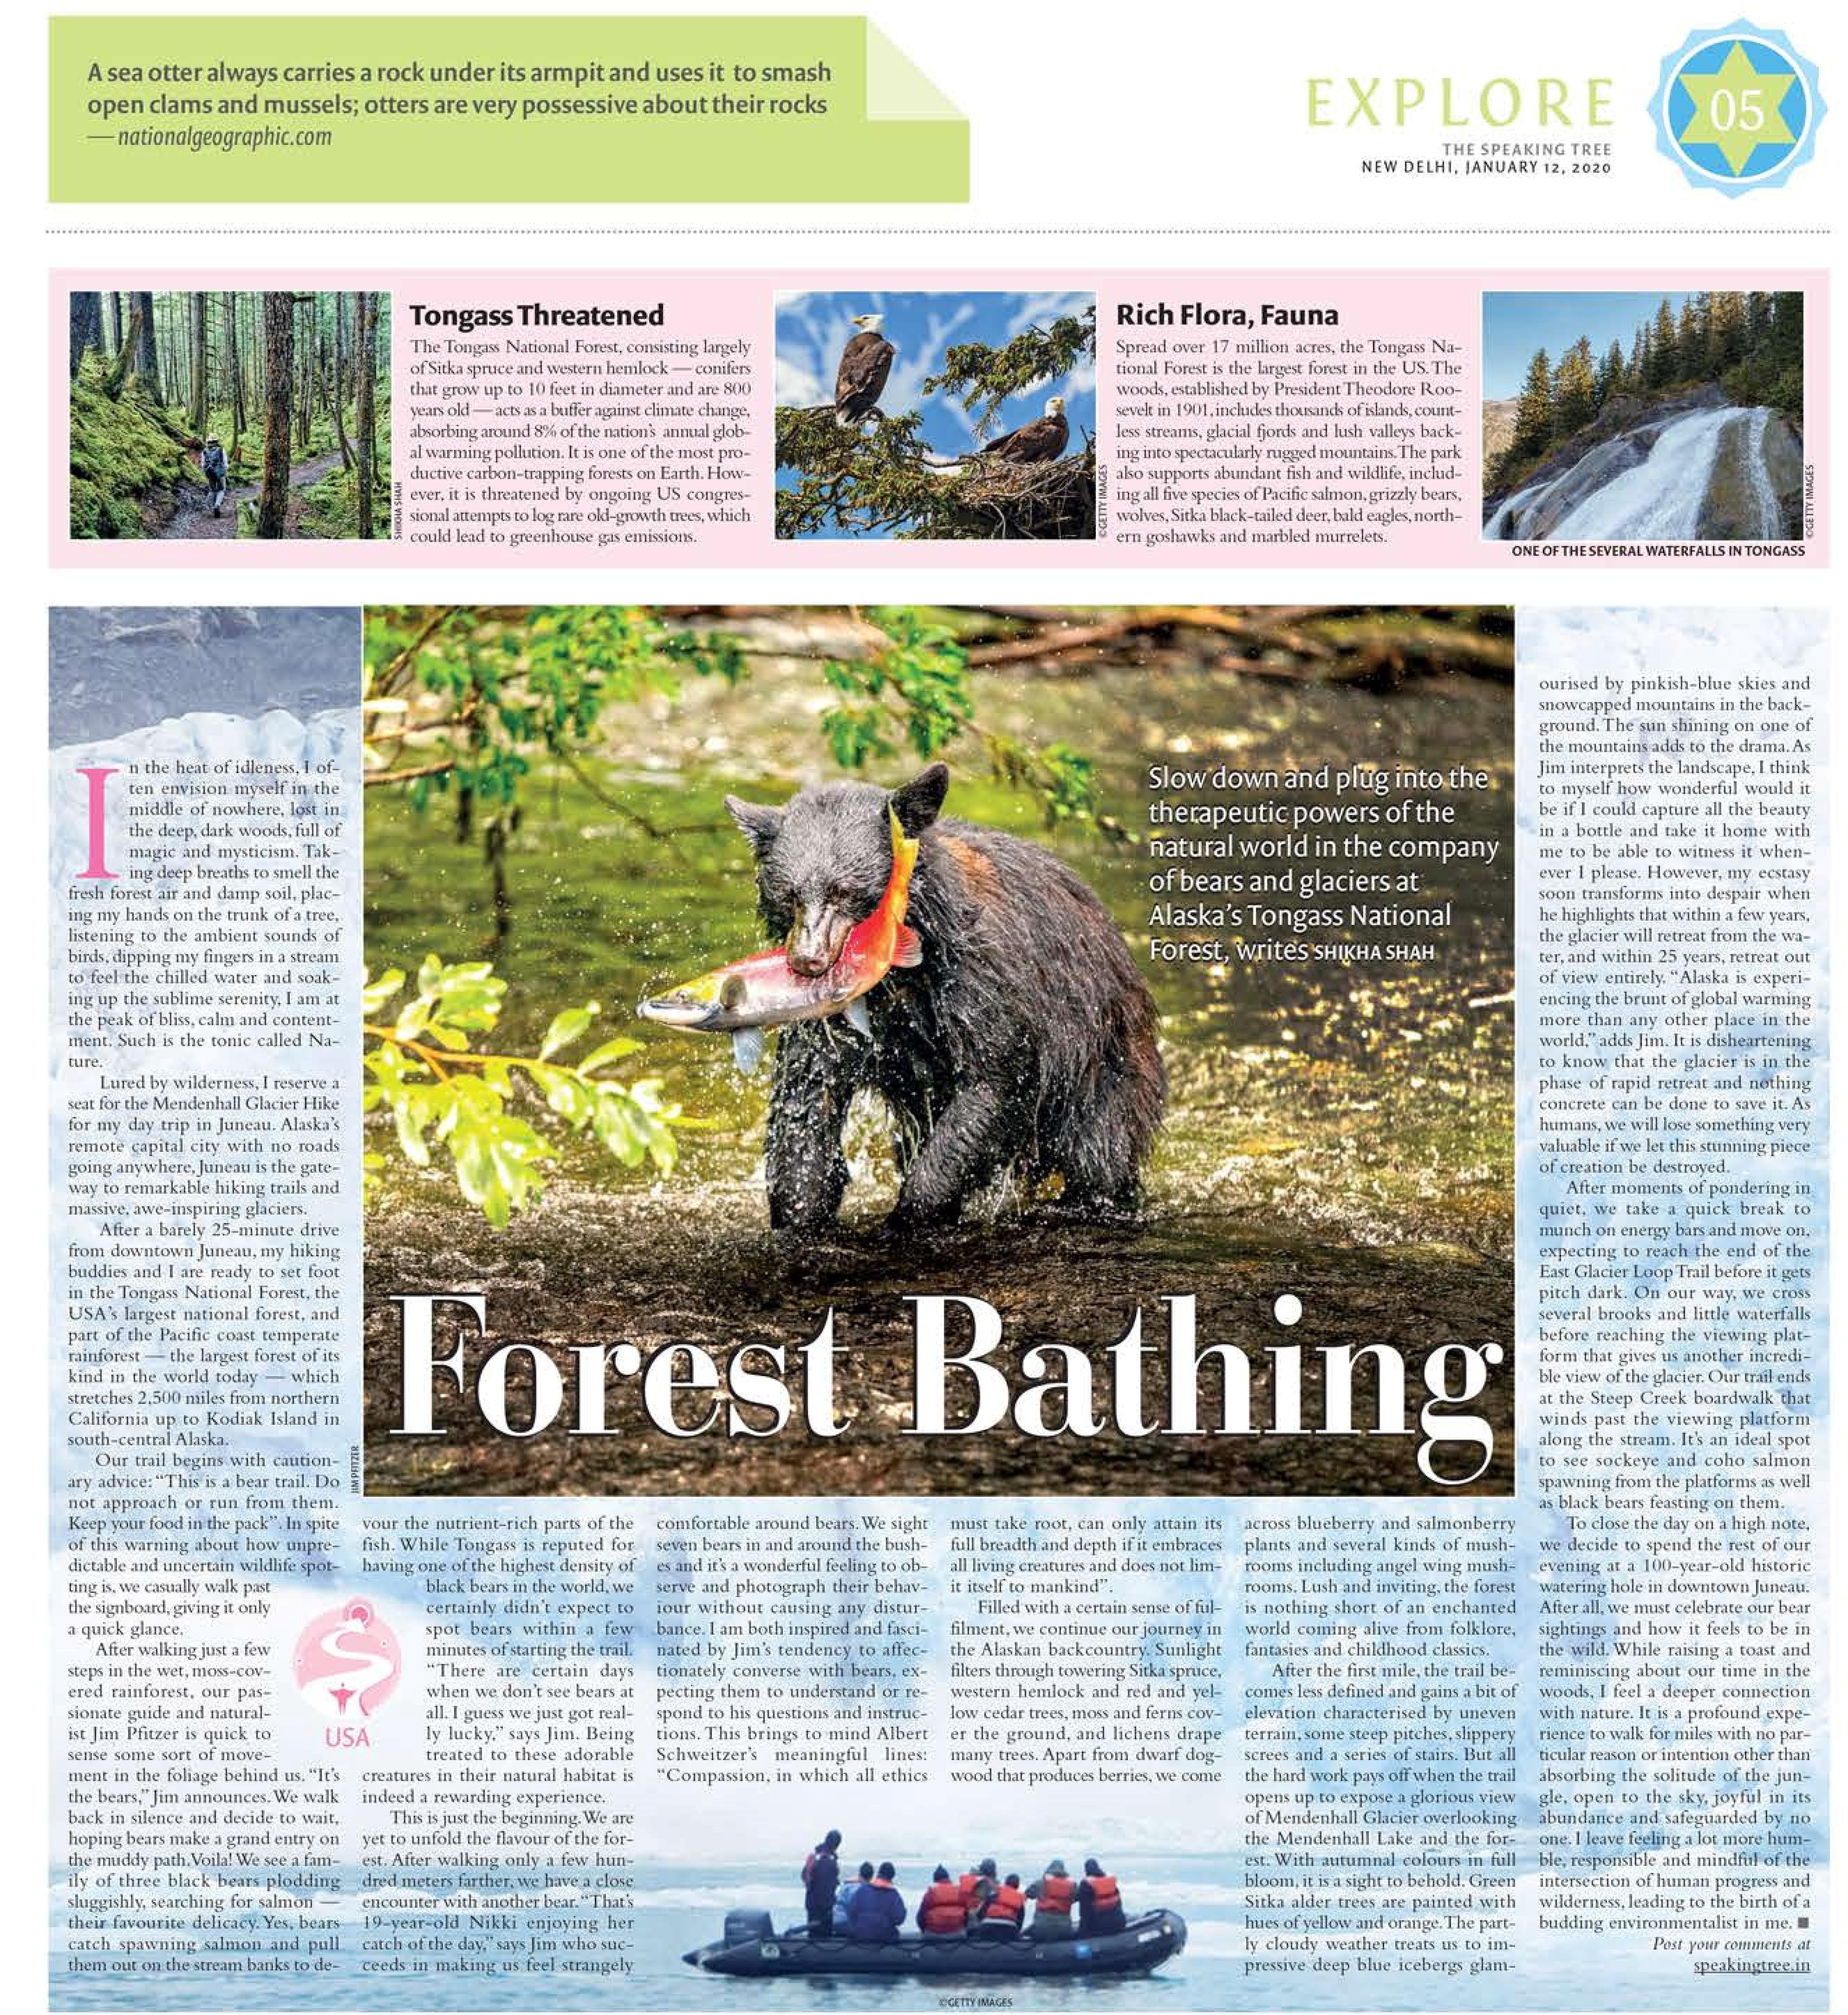 FOREST BATHING IN ALASKA (HIKE), THE SPEAKING TREE - JAN 12